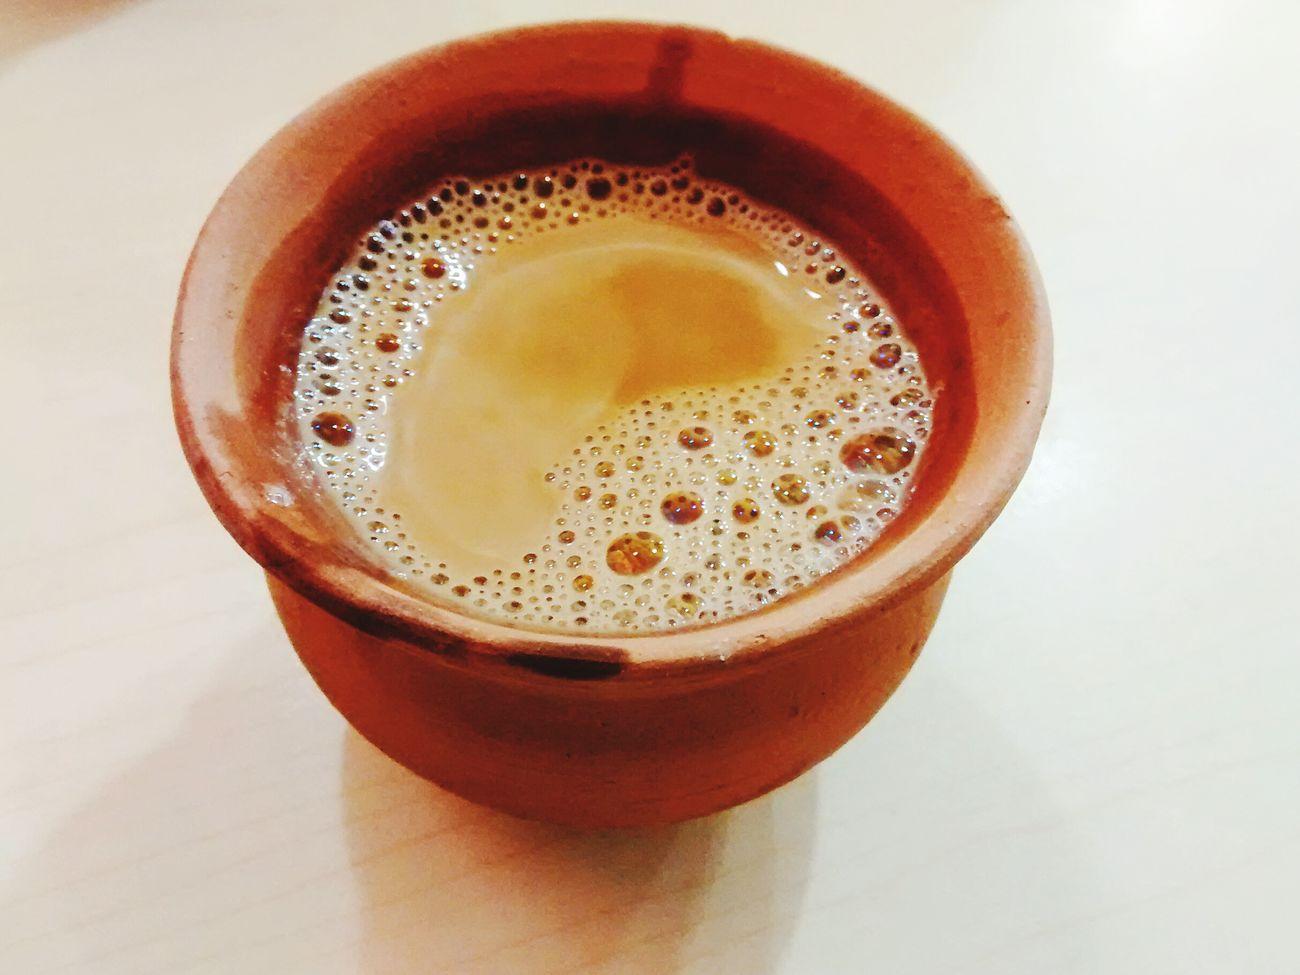 The best malai chaa on earth....:) Foodphotography EyeEm Best Shots EyeEm Gallery Mealtime